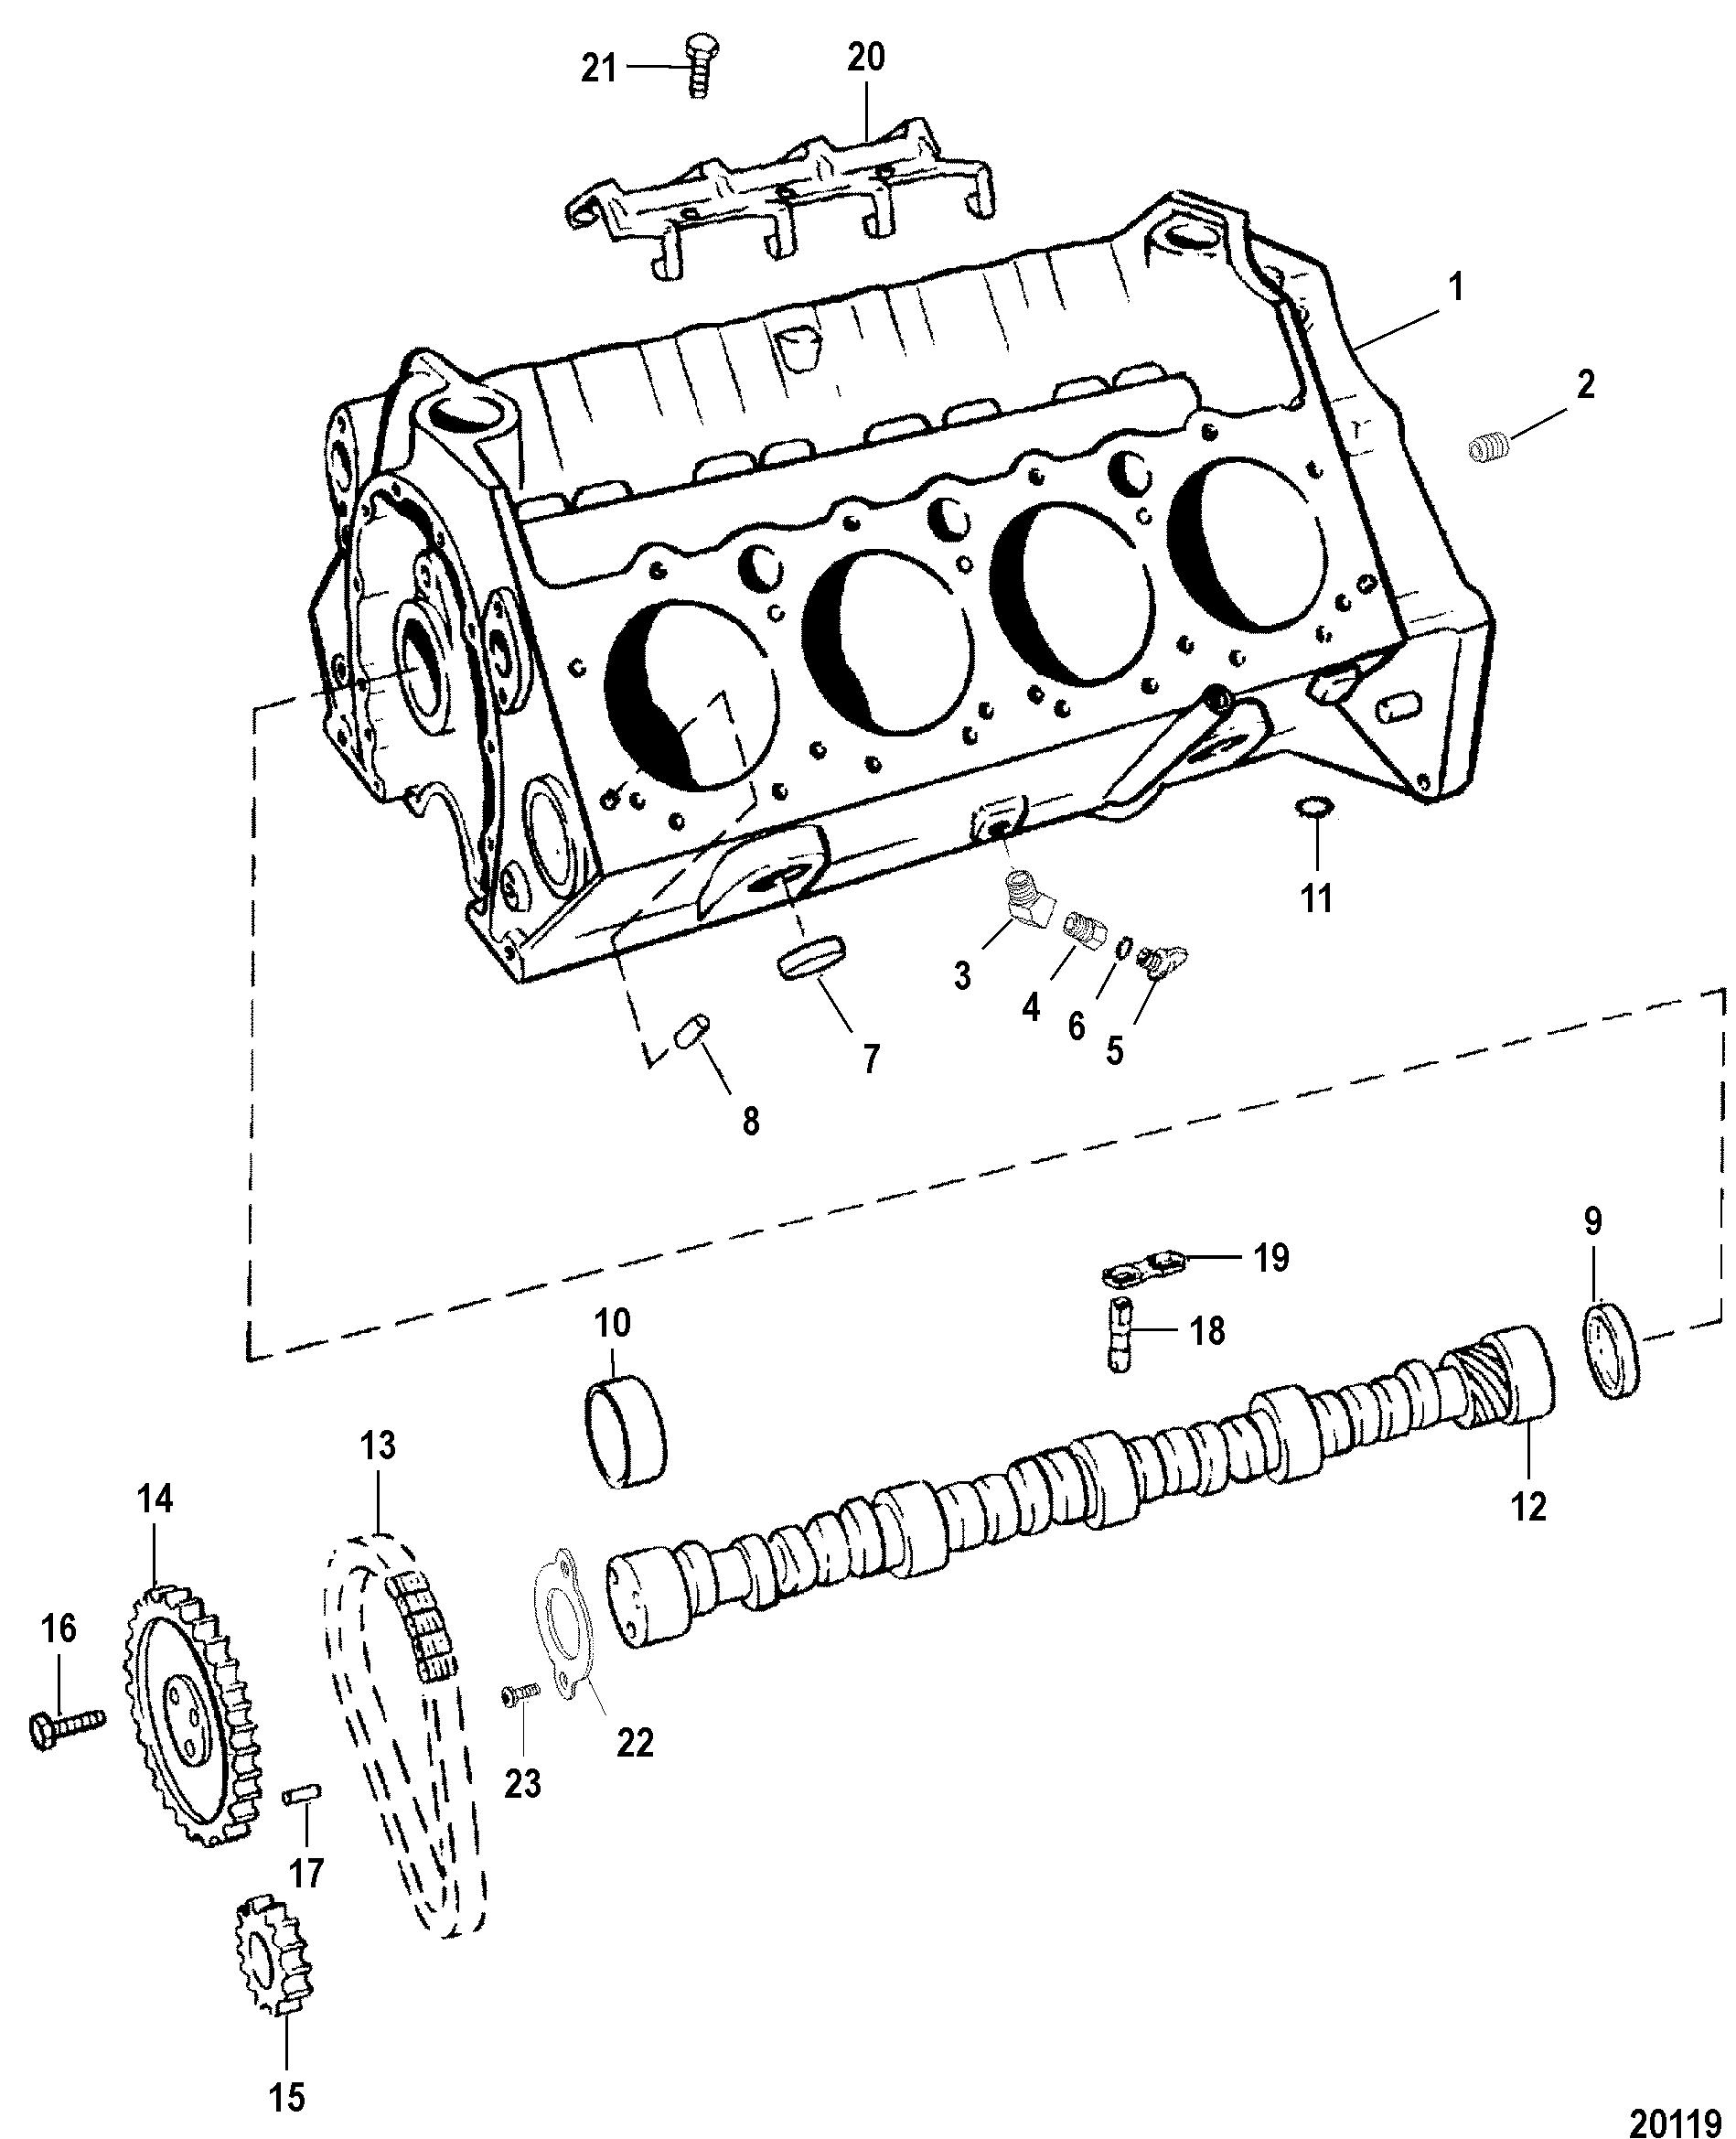 cylinder block and camshaft for mercruiser 454 502 mpi mag bravo gen vi Marine Engine Wiring Diagram cylinder block and camshaft for mercruiser 454 502 mpi mag bravo (gen vi)